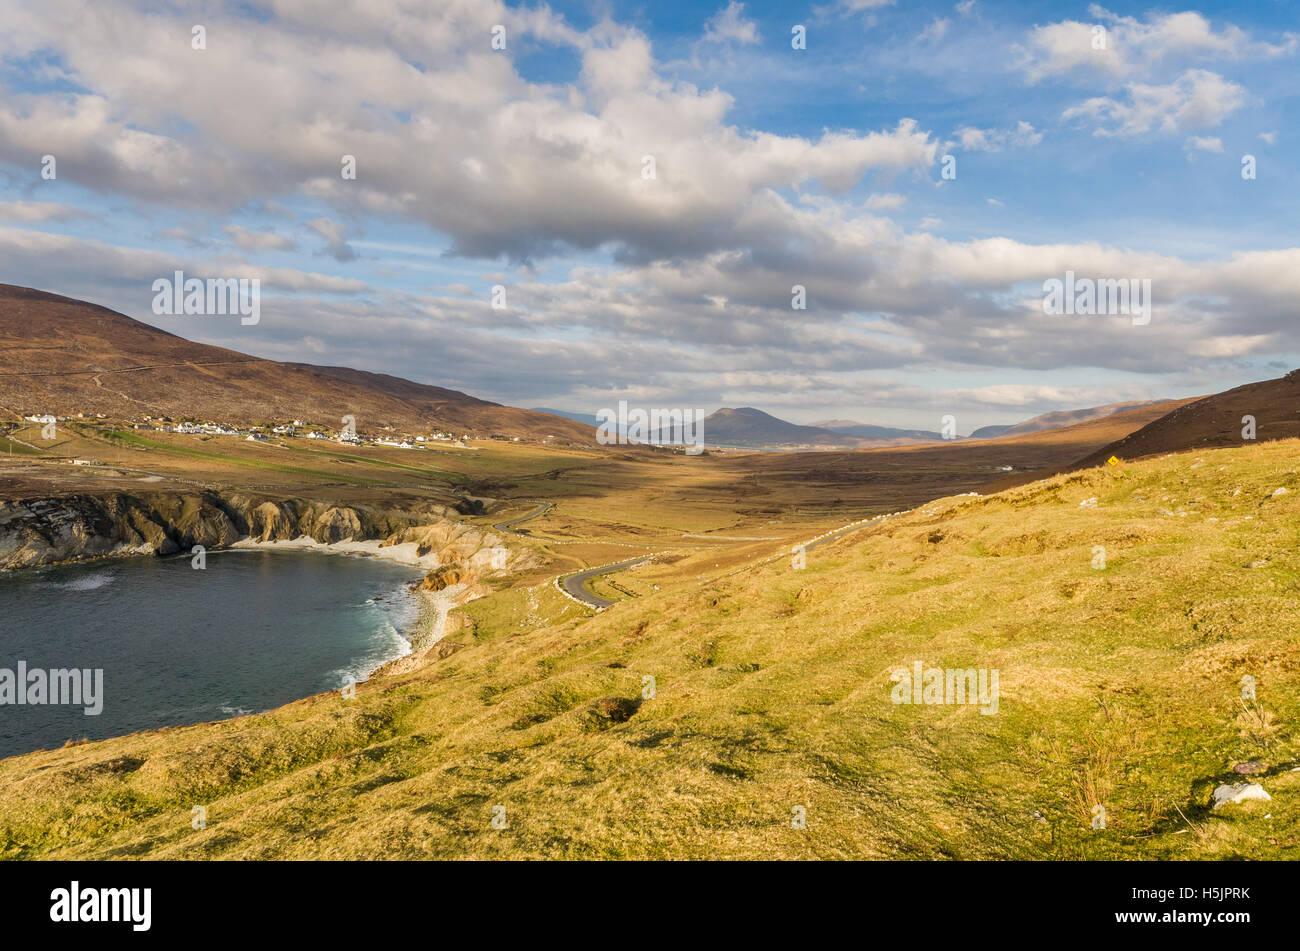 Atlantic road on Achill Island, County Mayo, Ireland. - Stock Image